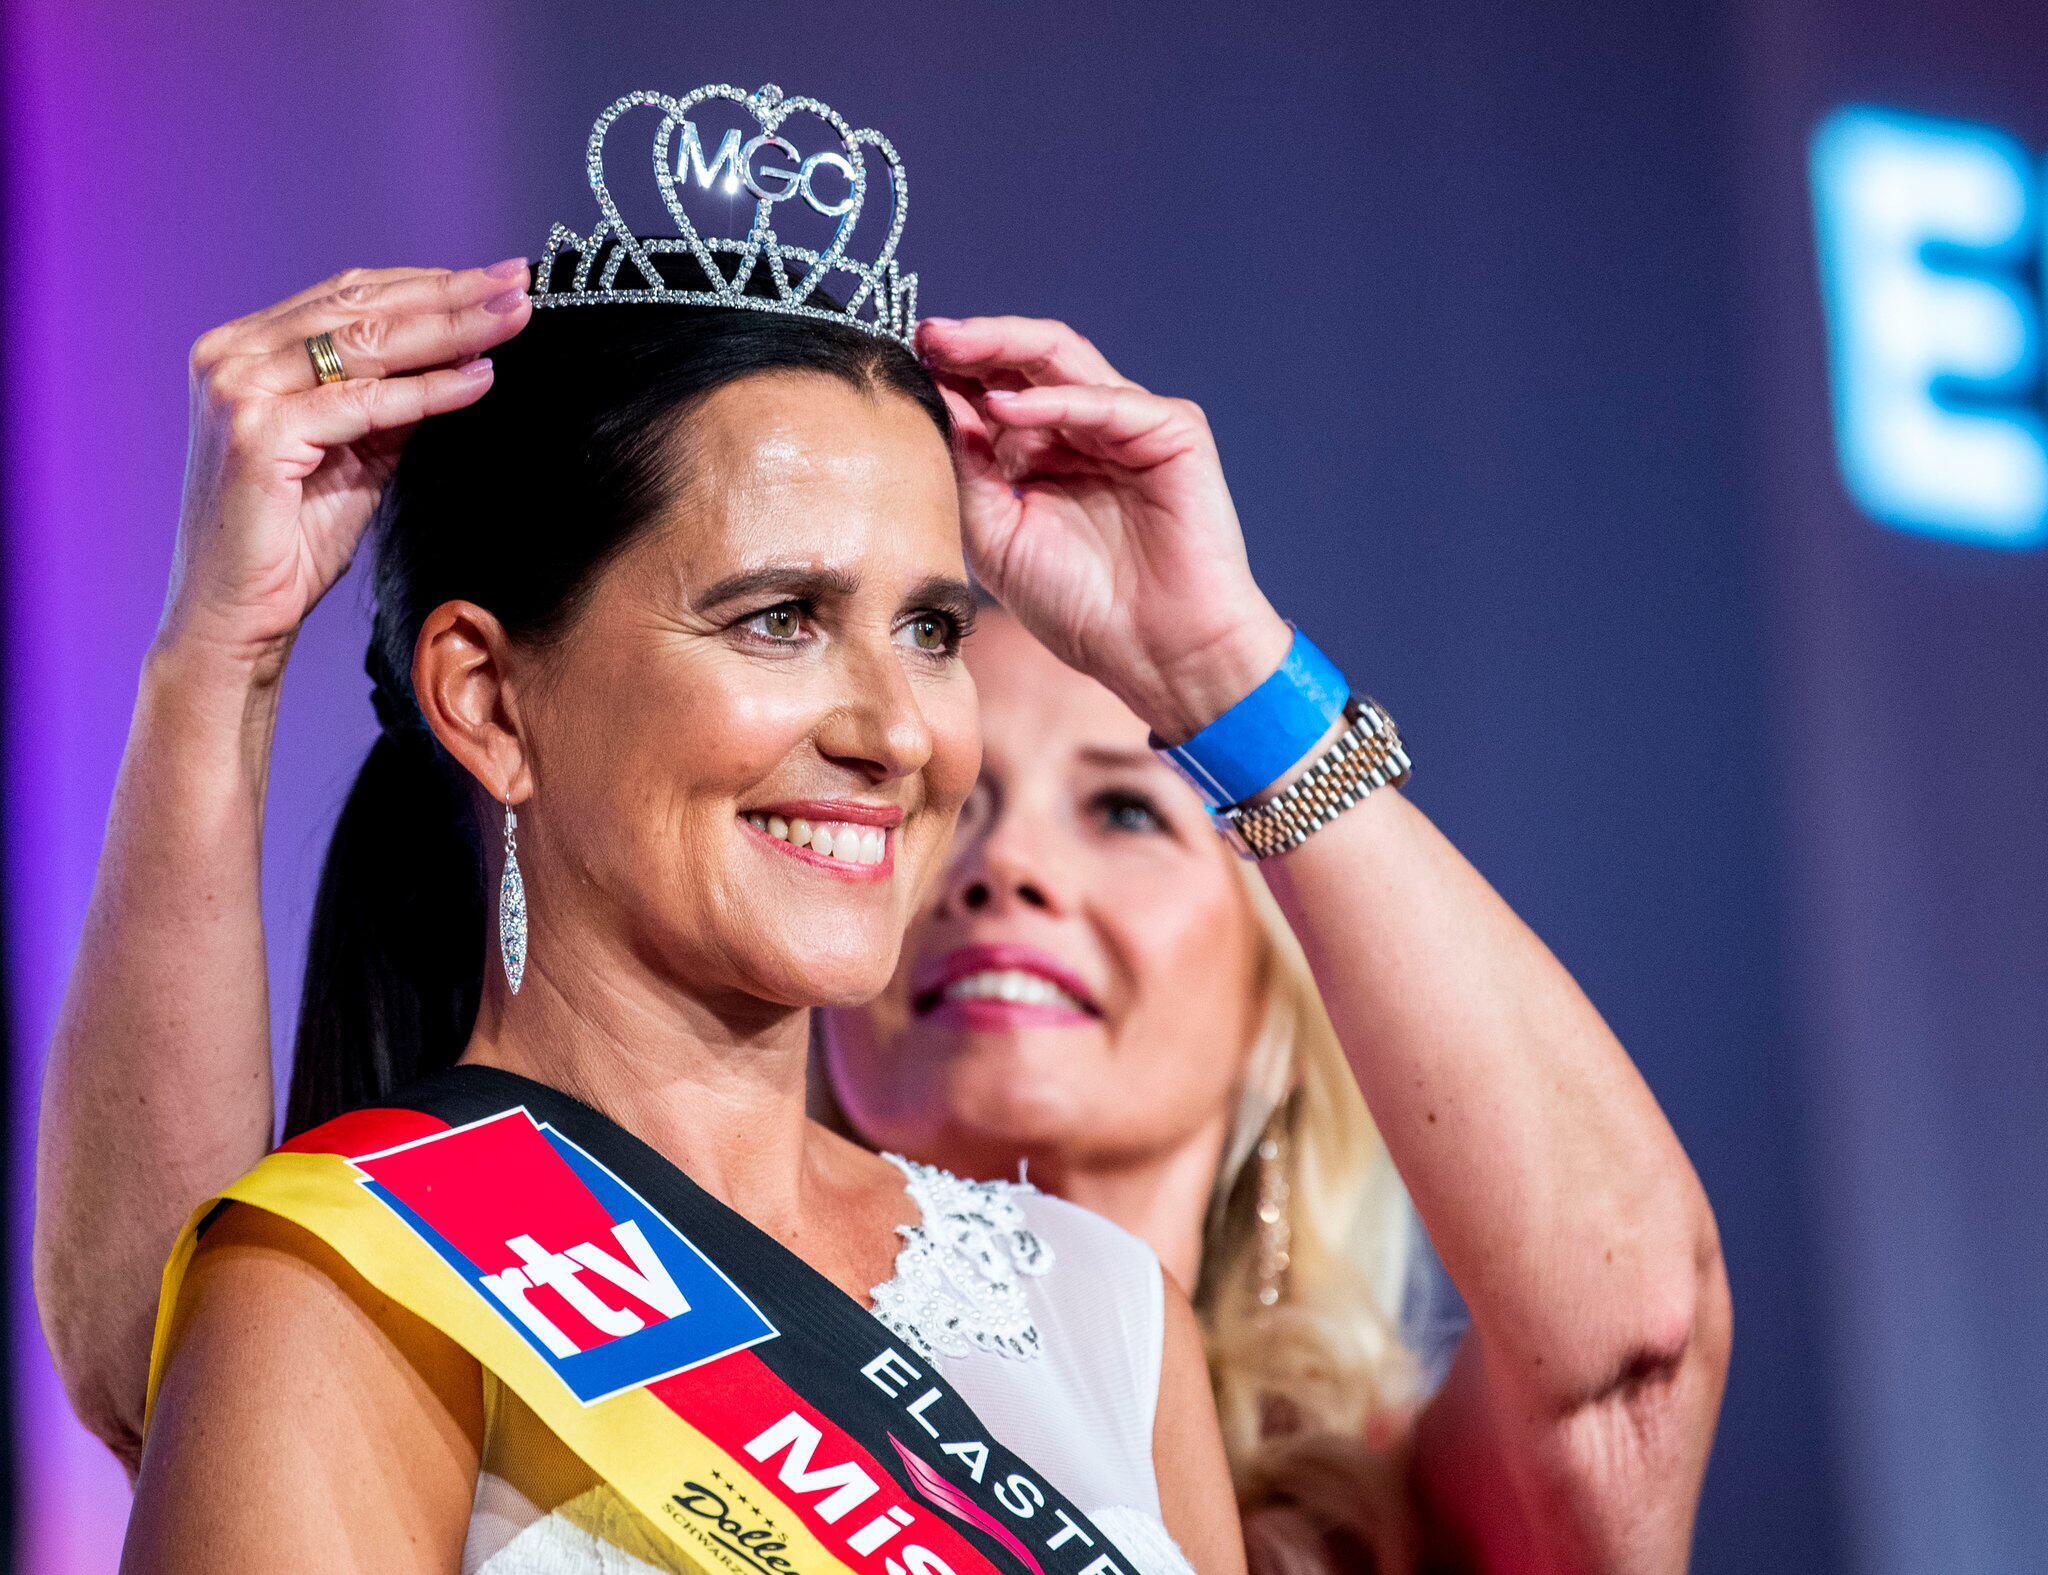 Bild zu Miss 50 plus contest in Germany